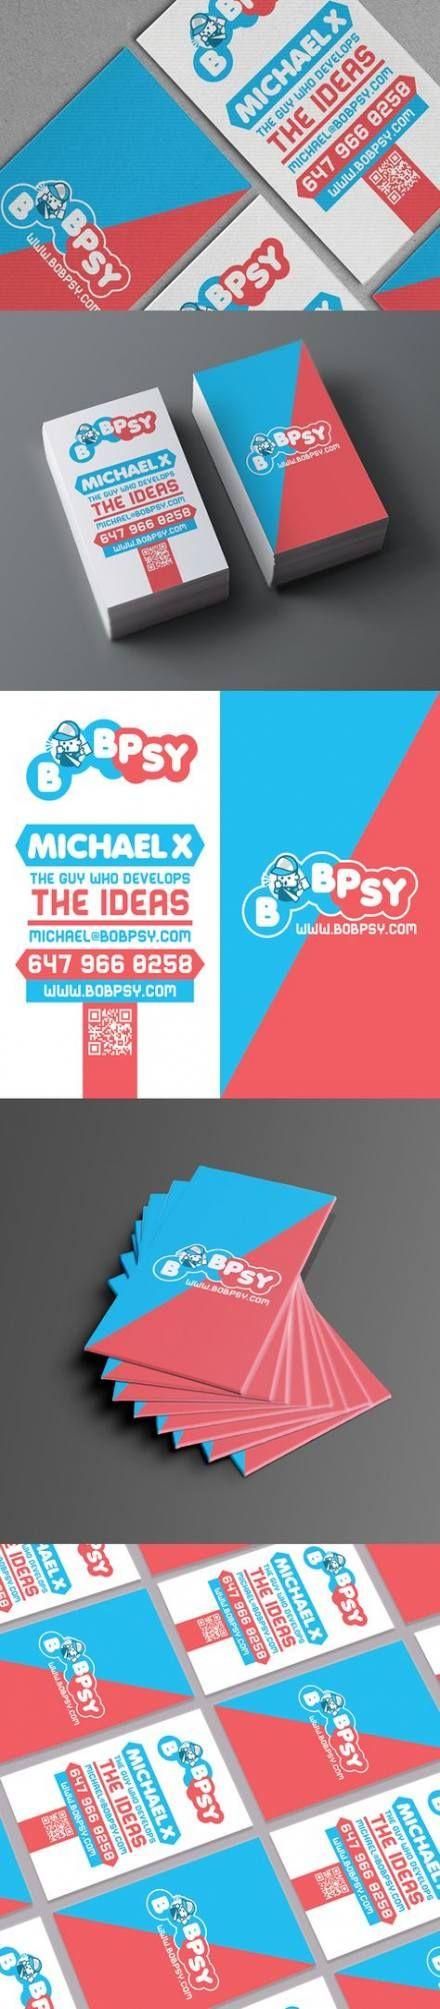 Business Cars Design Blue Behance 31 Ideas Business Card Logo Design Business Card Design Name Card Design